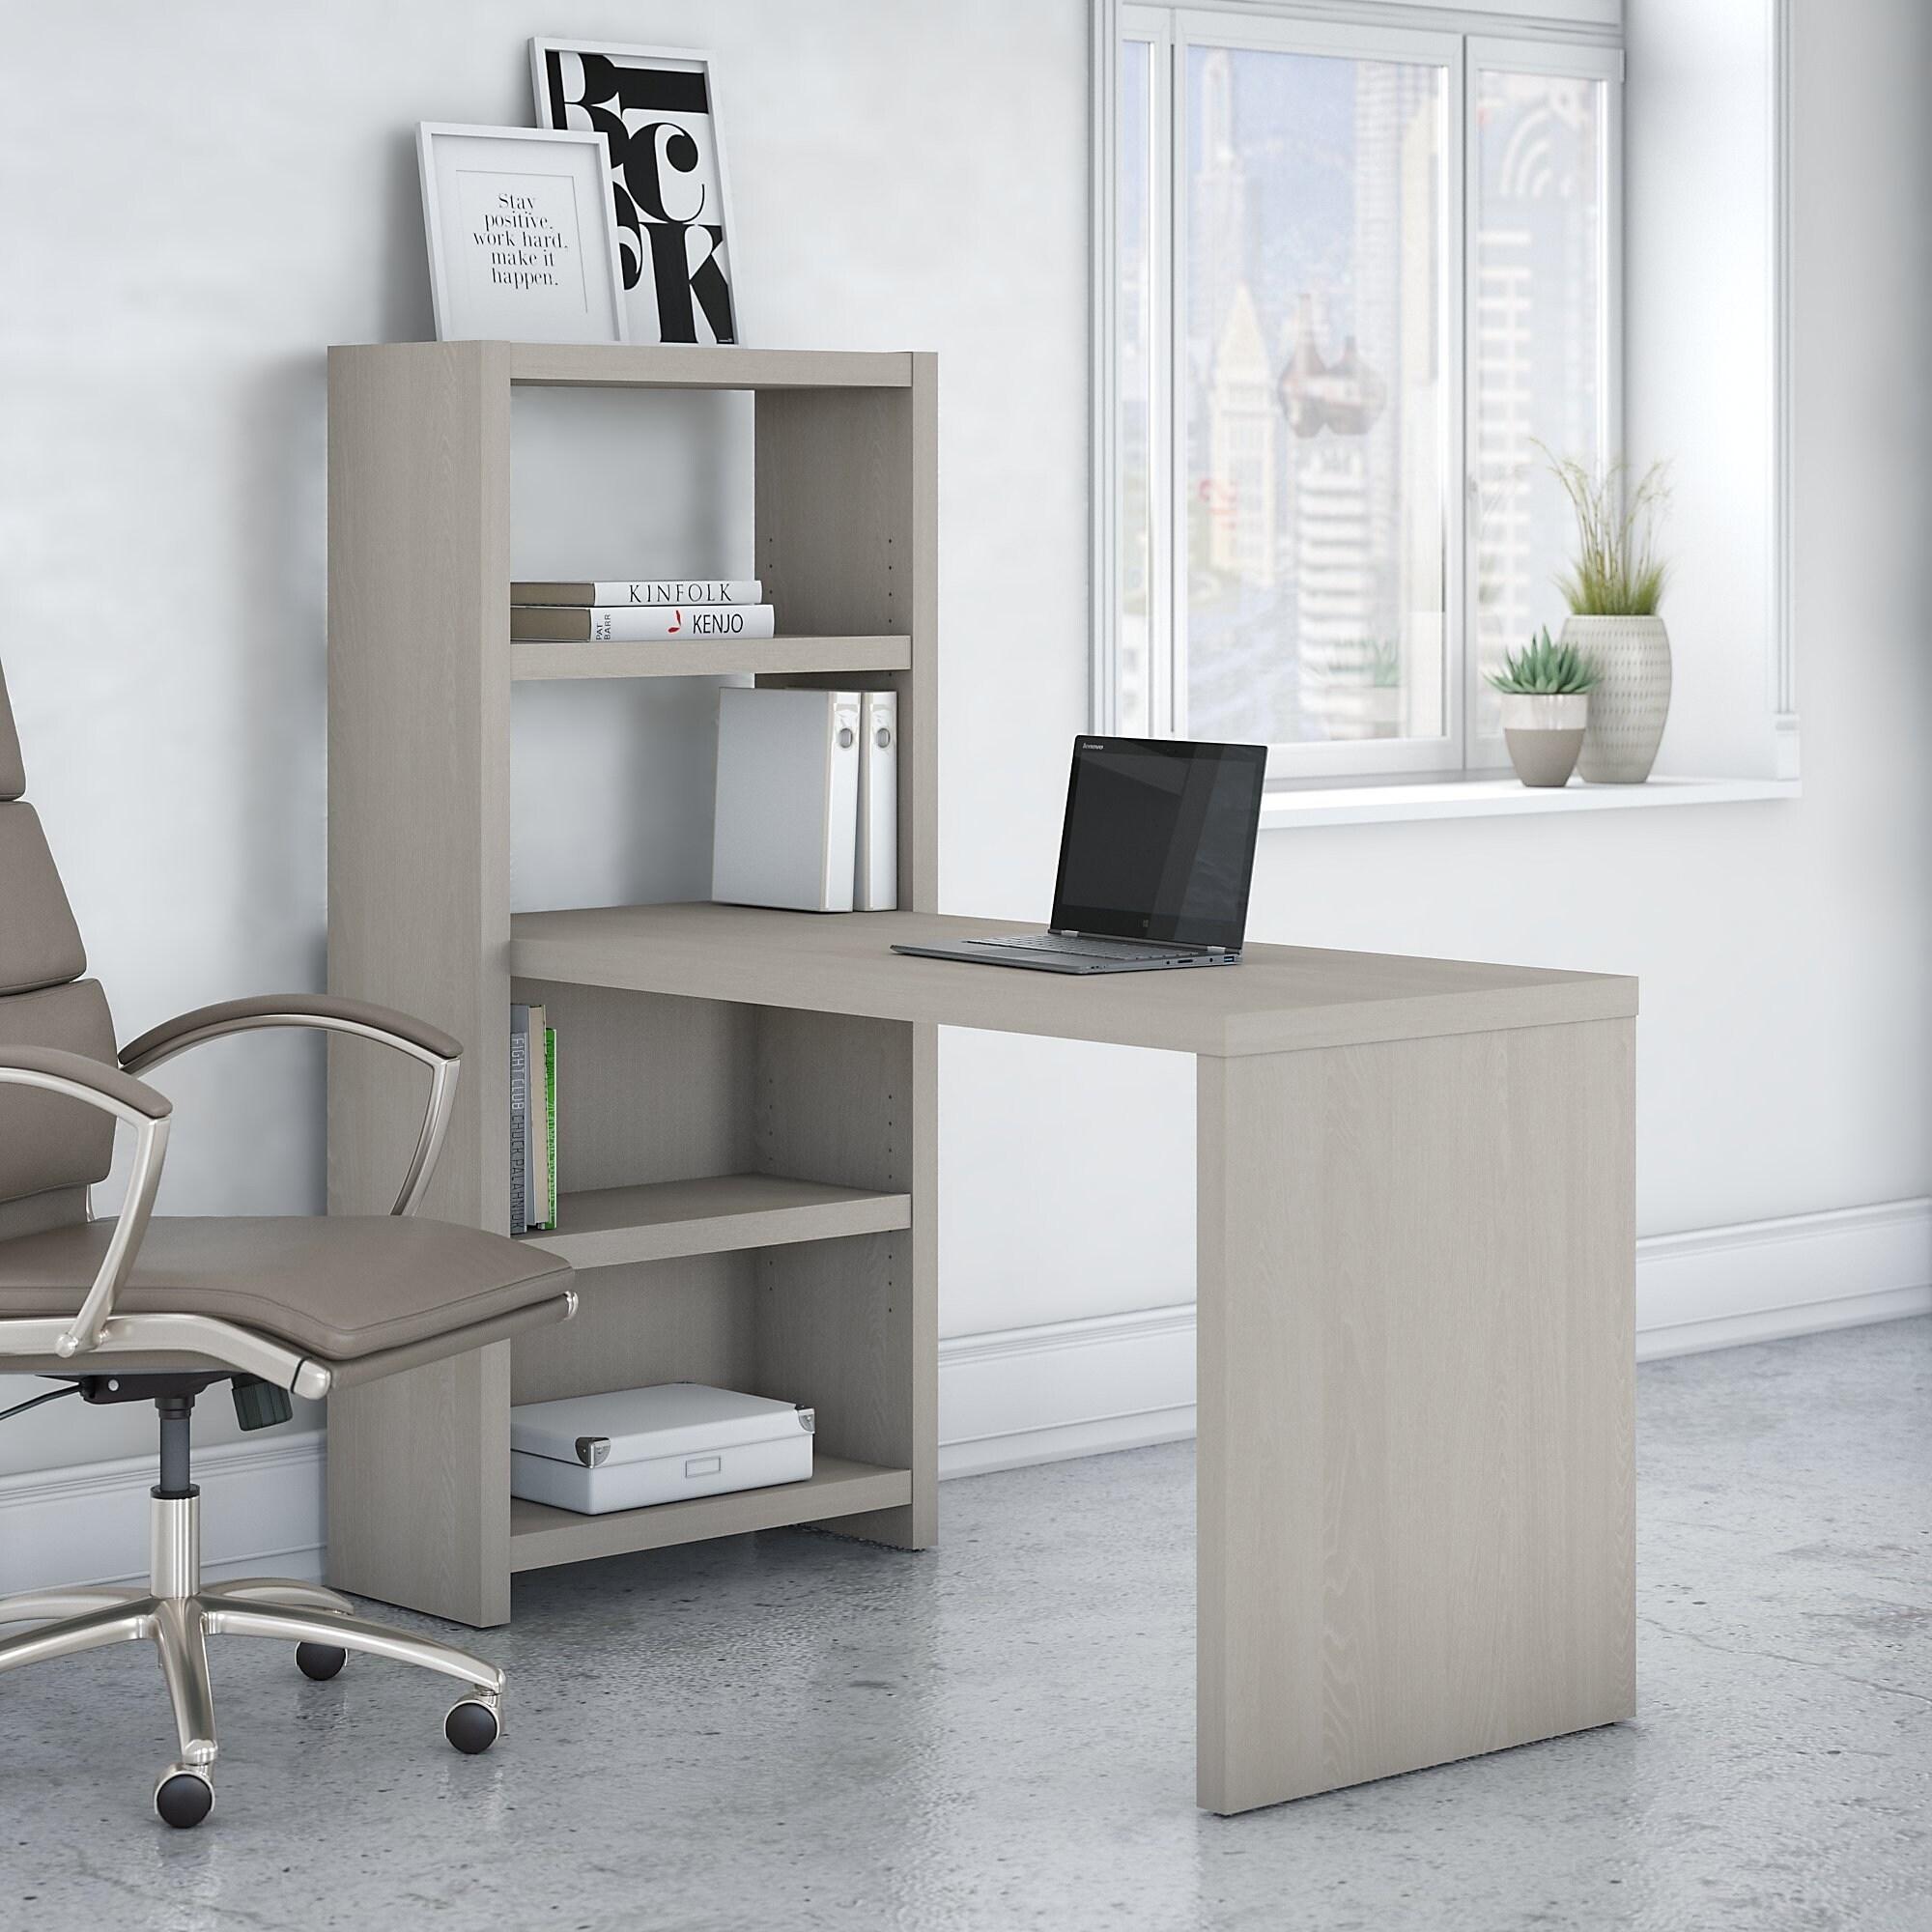 Office by kathy ireland Echo 56W Bookcase Desk